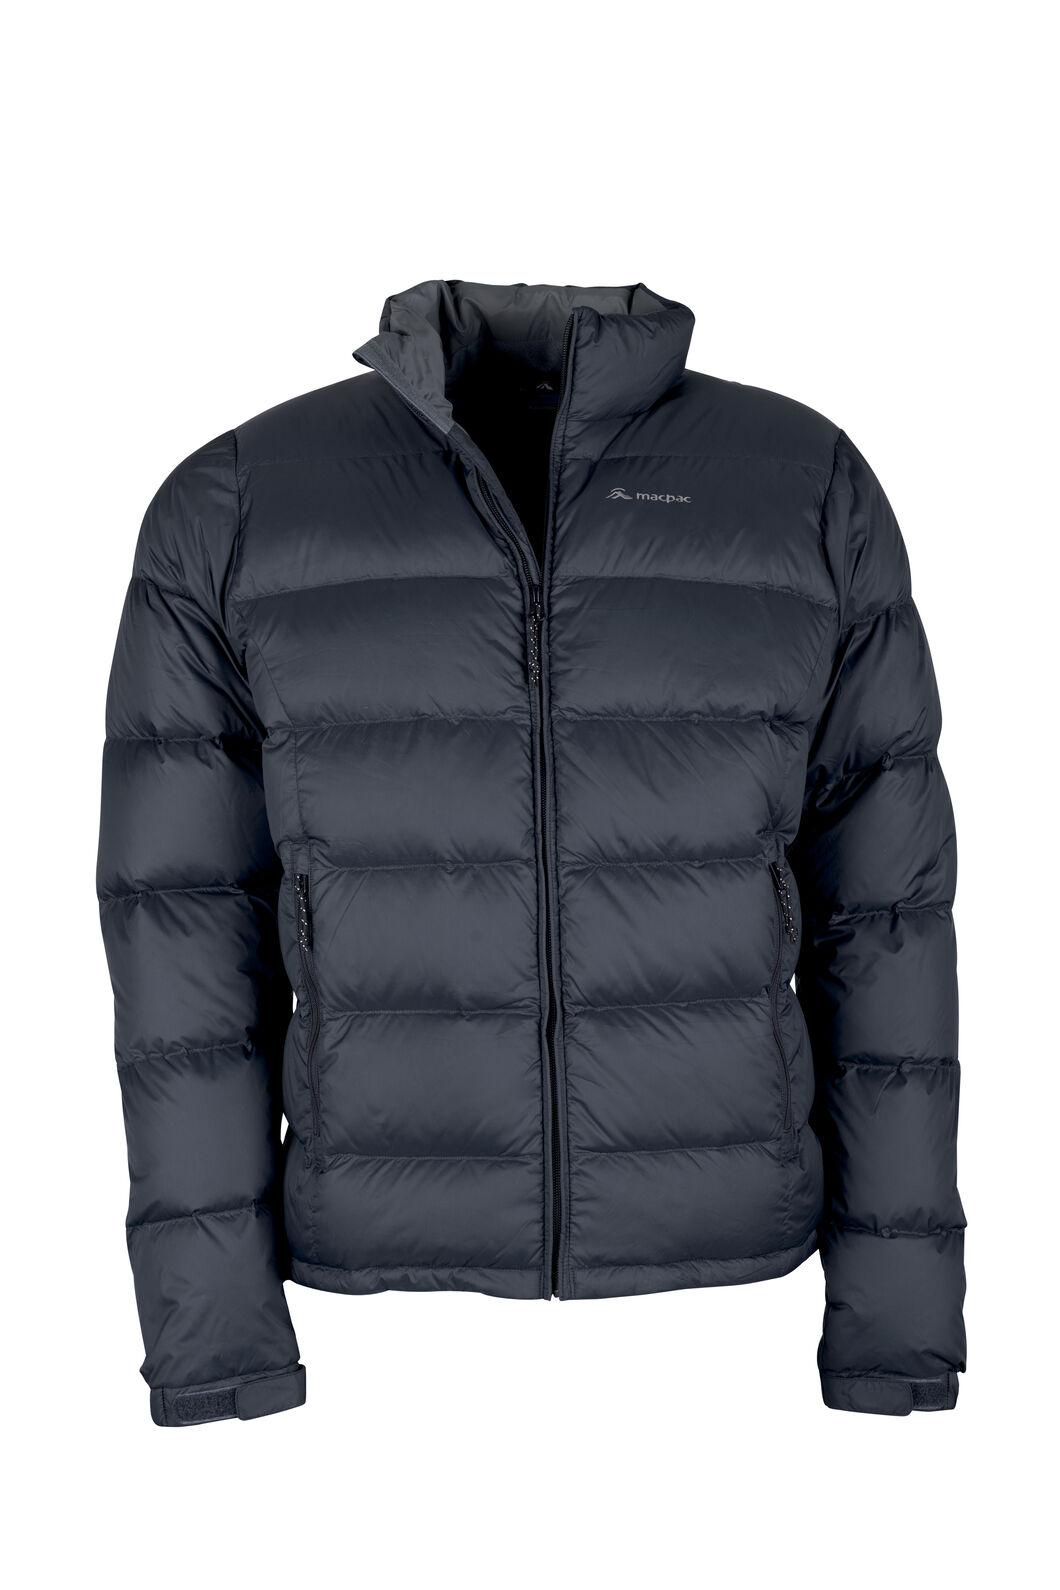 Macpac Halo Down Jacket - Men's, Black, hi-res